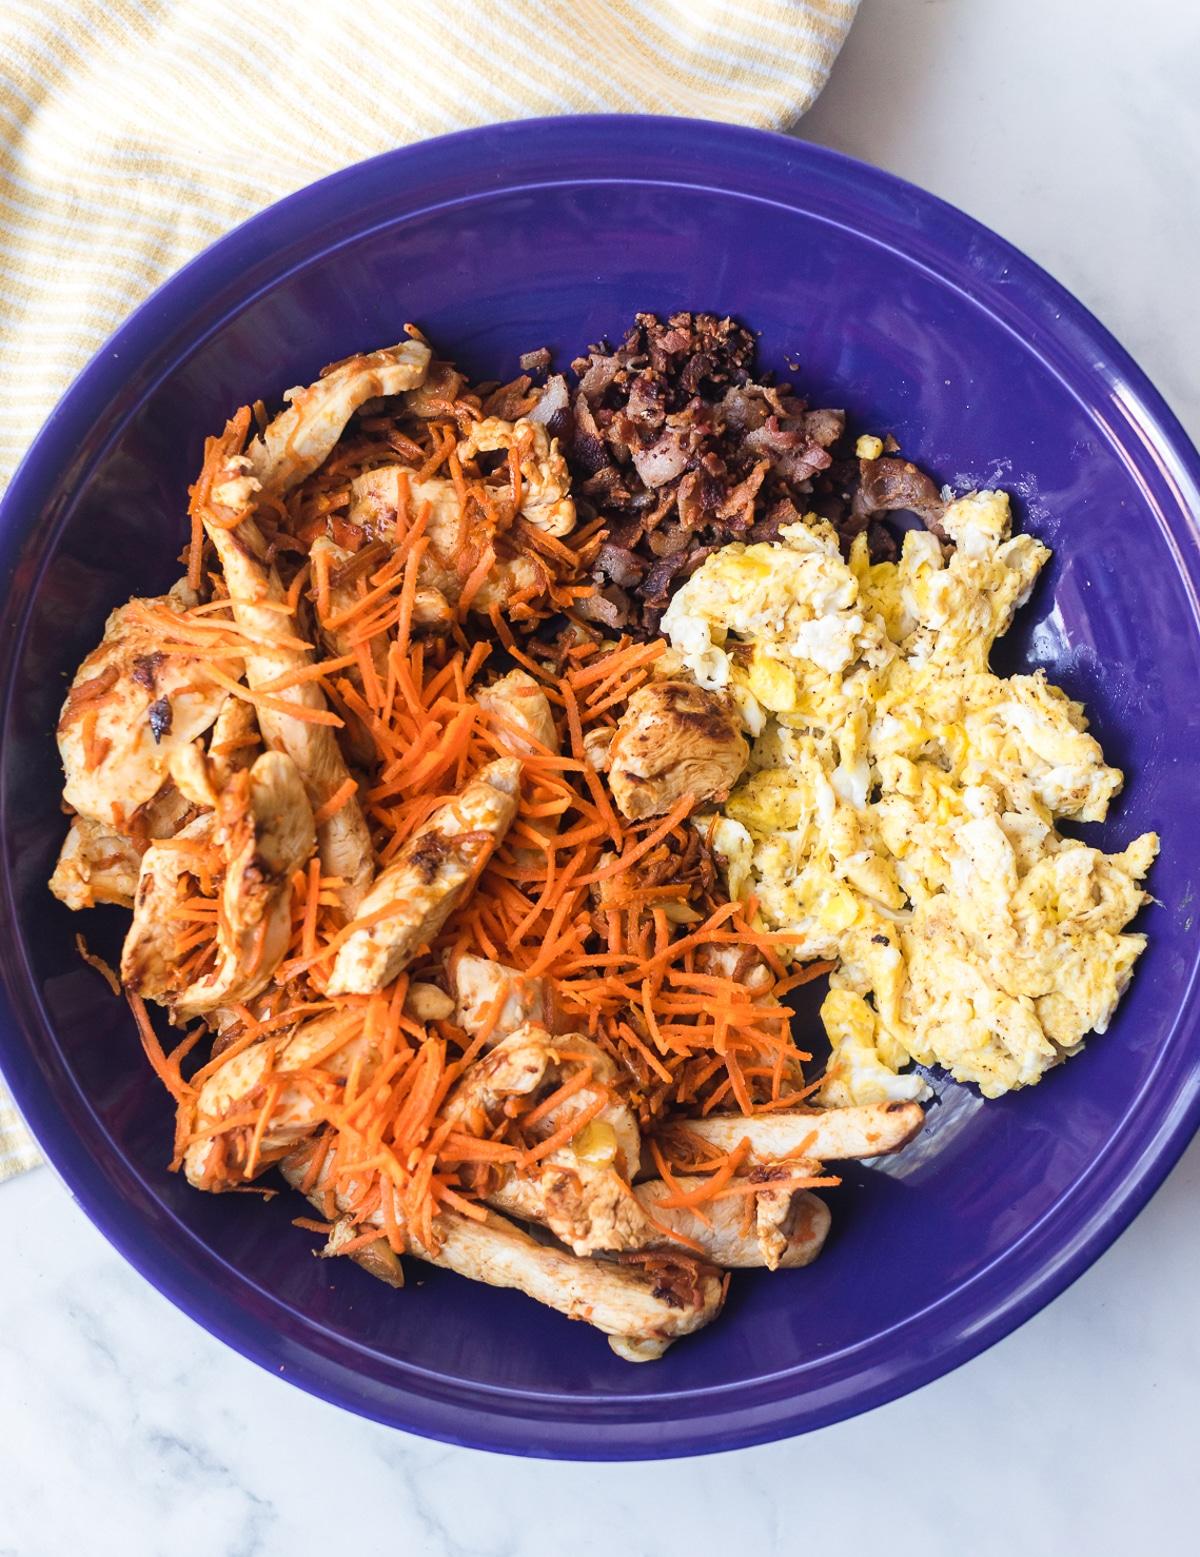 Making Cauliflower Fried Rice Recipe #ASpicyPerspective #cauliflower #chicken #paleo #keto #lowcarb